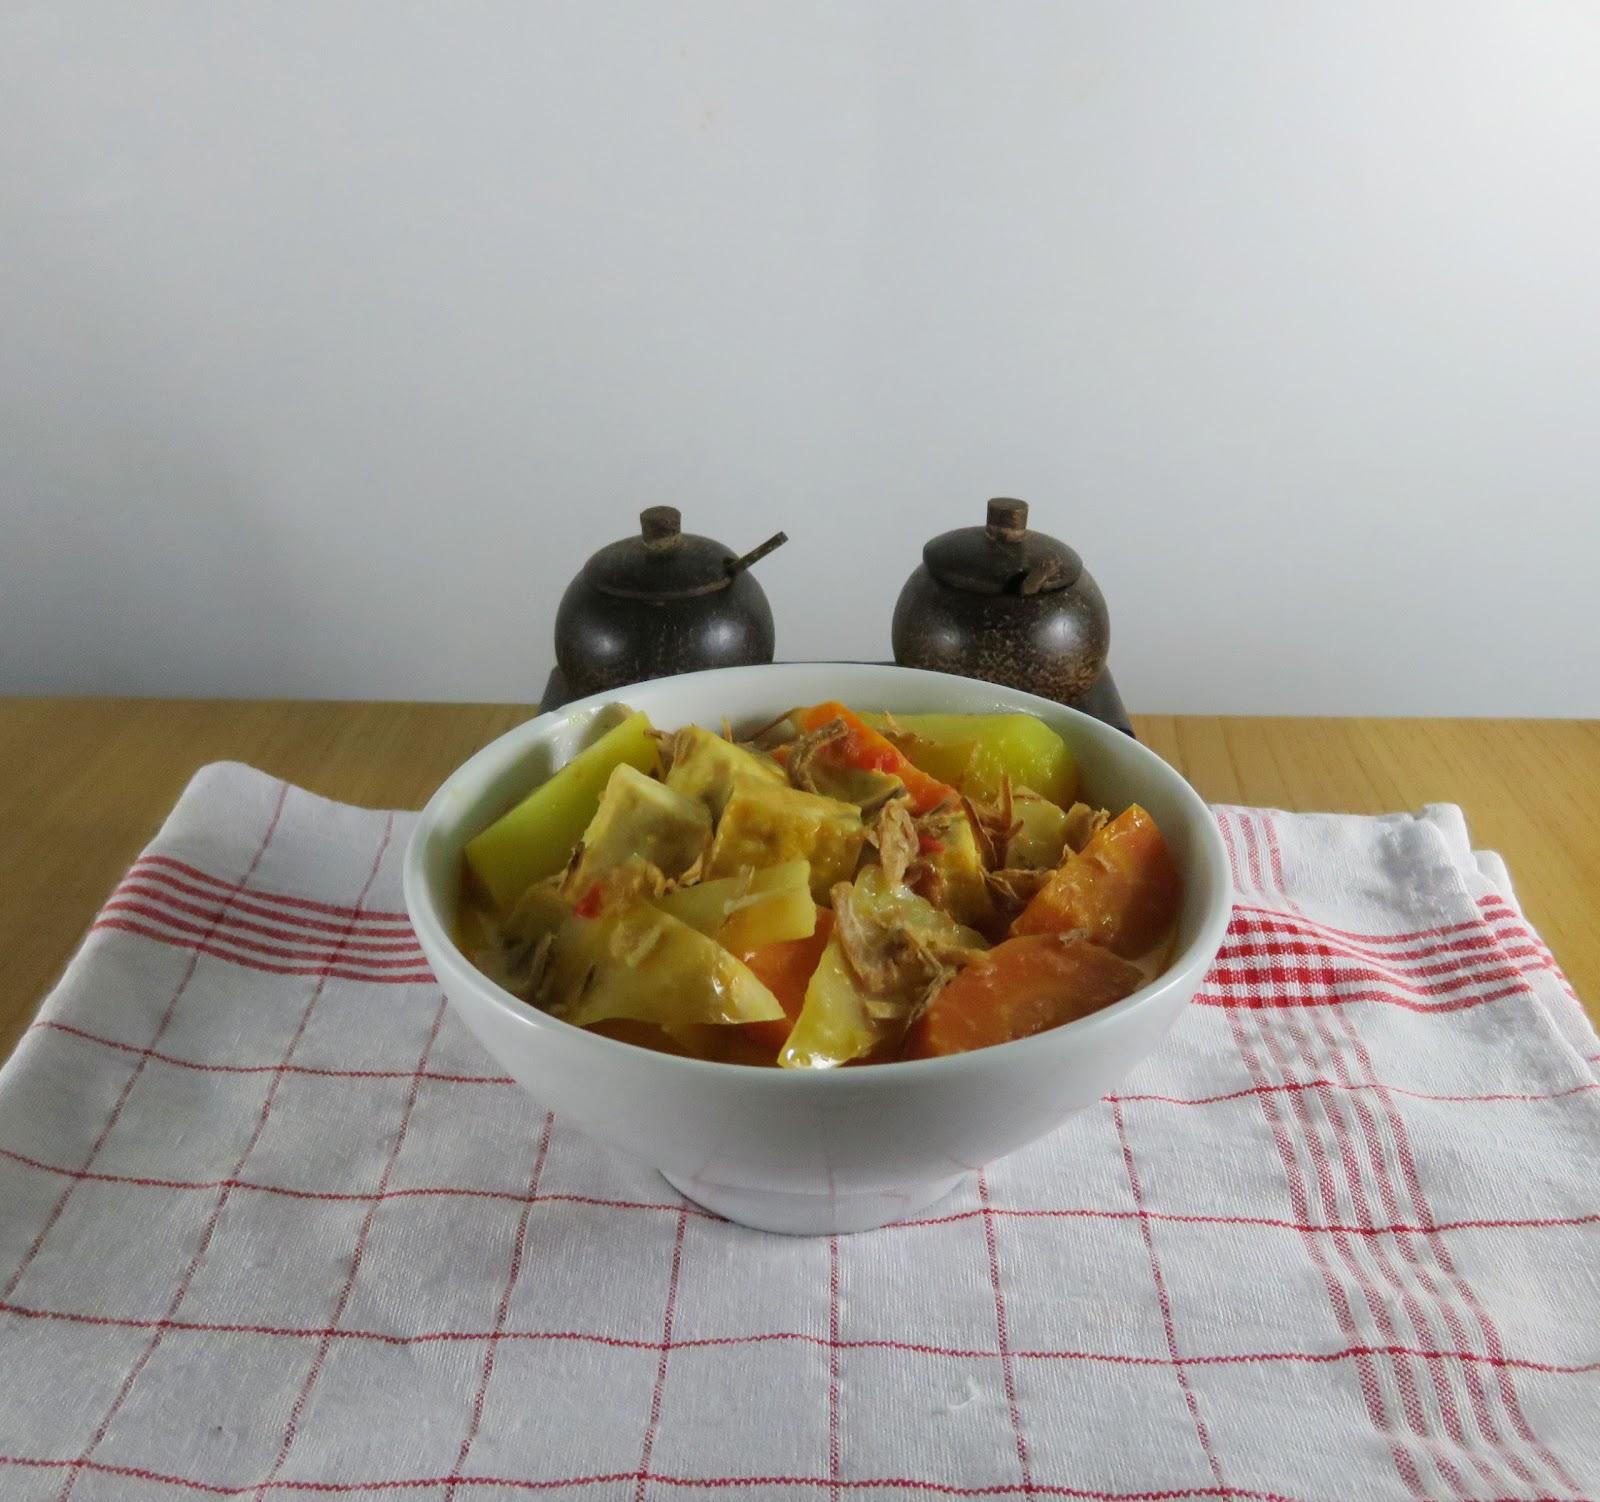 indonesisch kochen One-Pot Meals: Tofu Gemüse mit Sambal Oelek Gewürzmischung